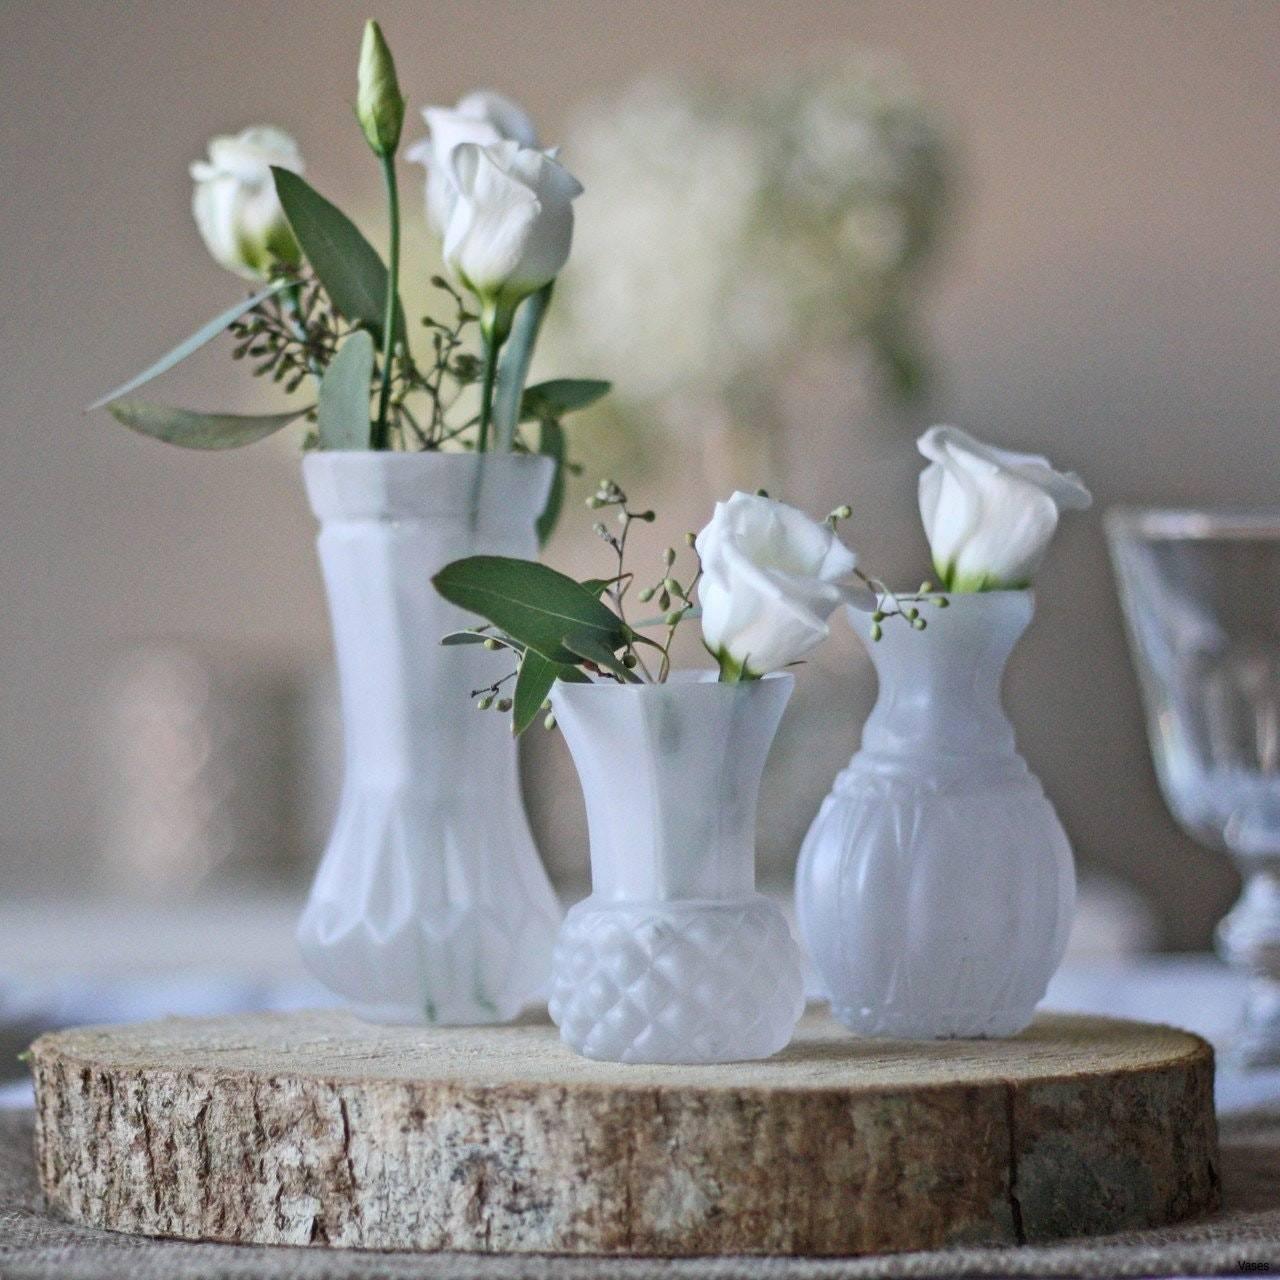 unity sand vase of pictures of wedding reception tables luxury jar flower 1h vases bud pertaining to pictures of wedding reception tables luxury jar flower 1h vases bud wedding vase centerpiece idea i